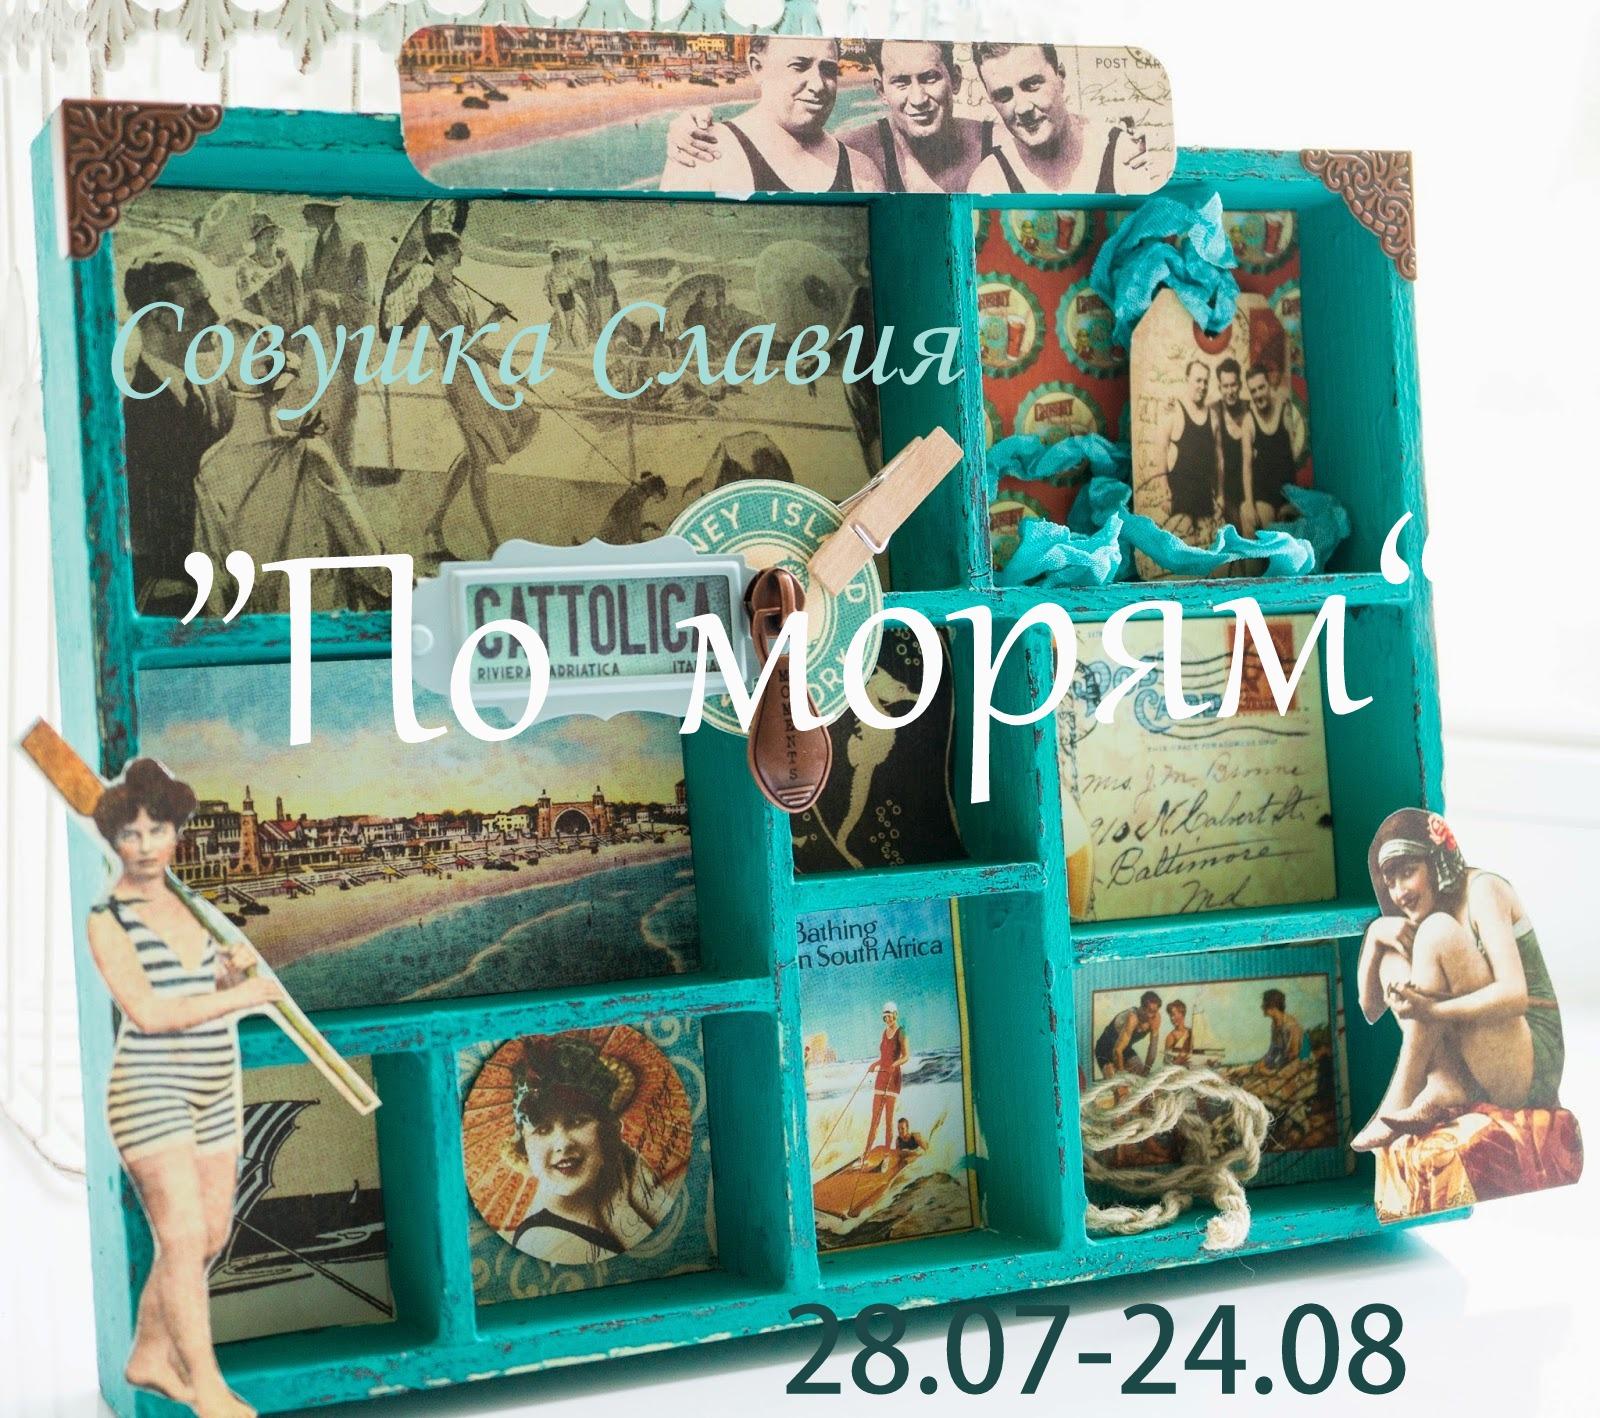 http://sovushkaslavia.blogspot.ru/2014/07/blog-post_28.html